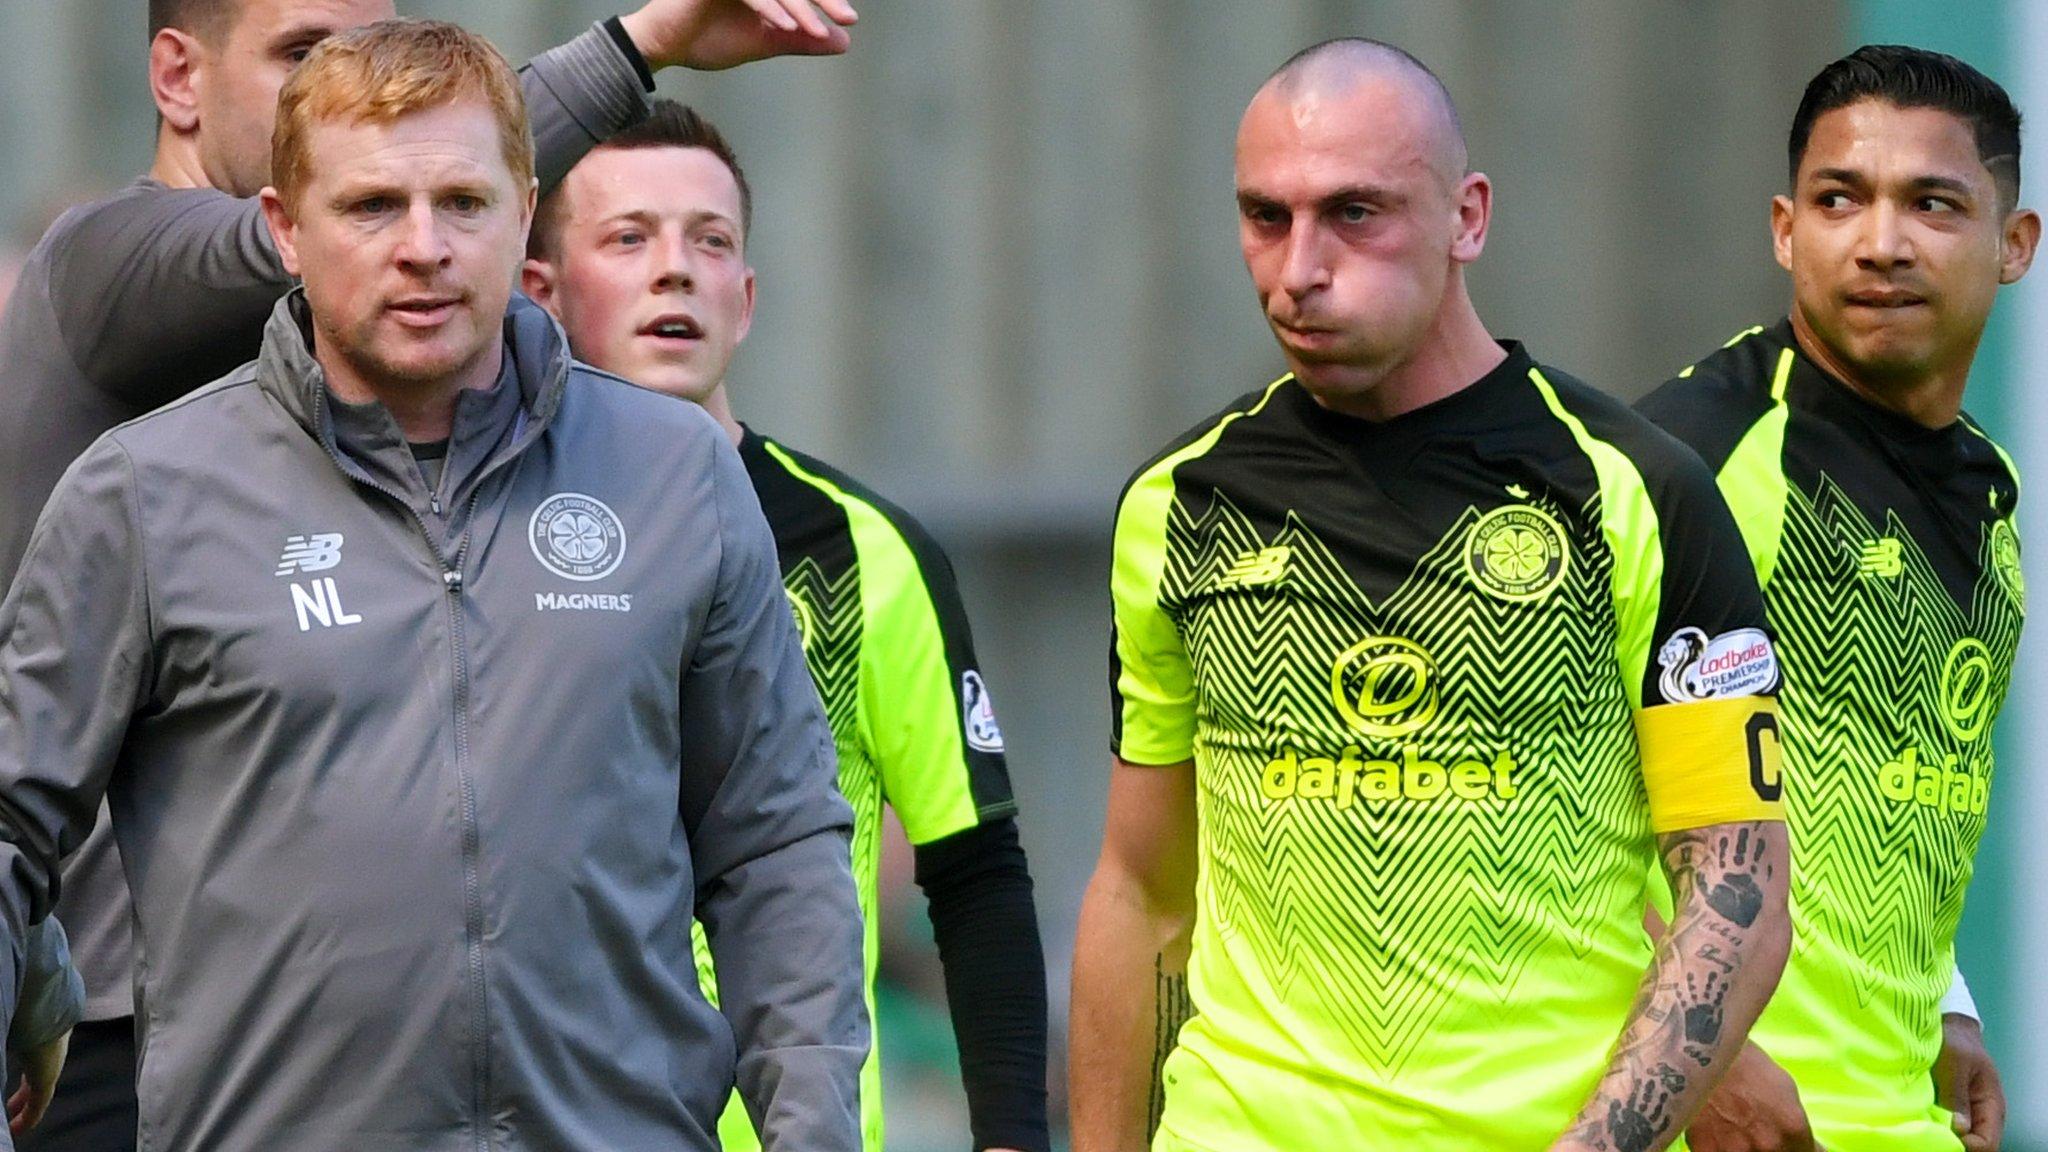 Hibernian 0-0 Celtic: League leaders held to goalless draw